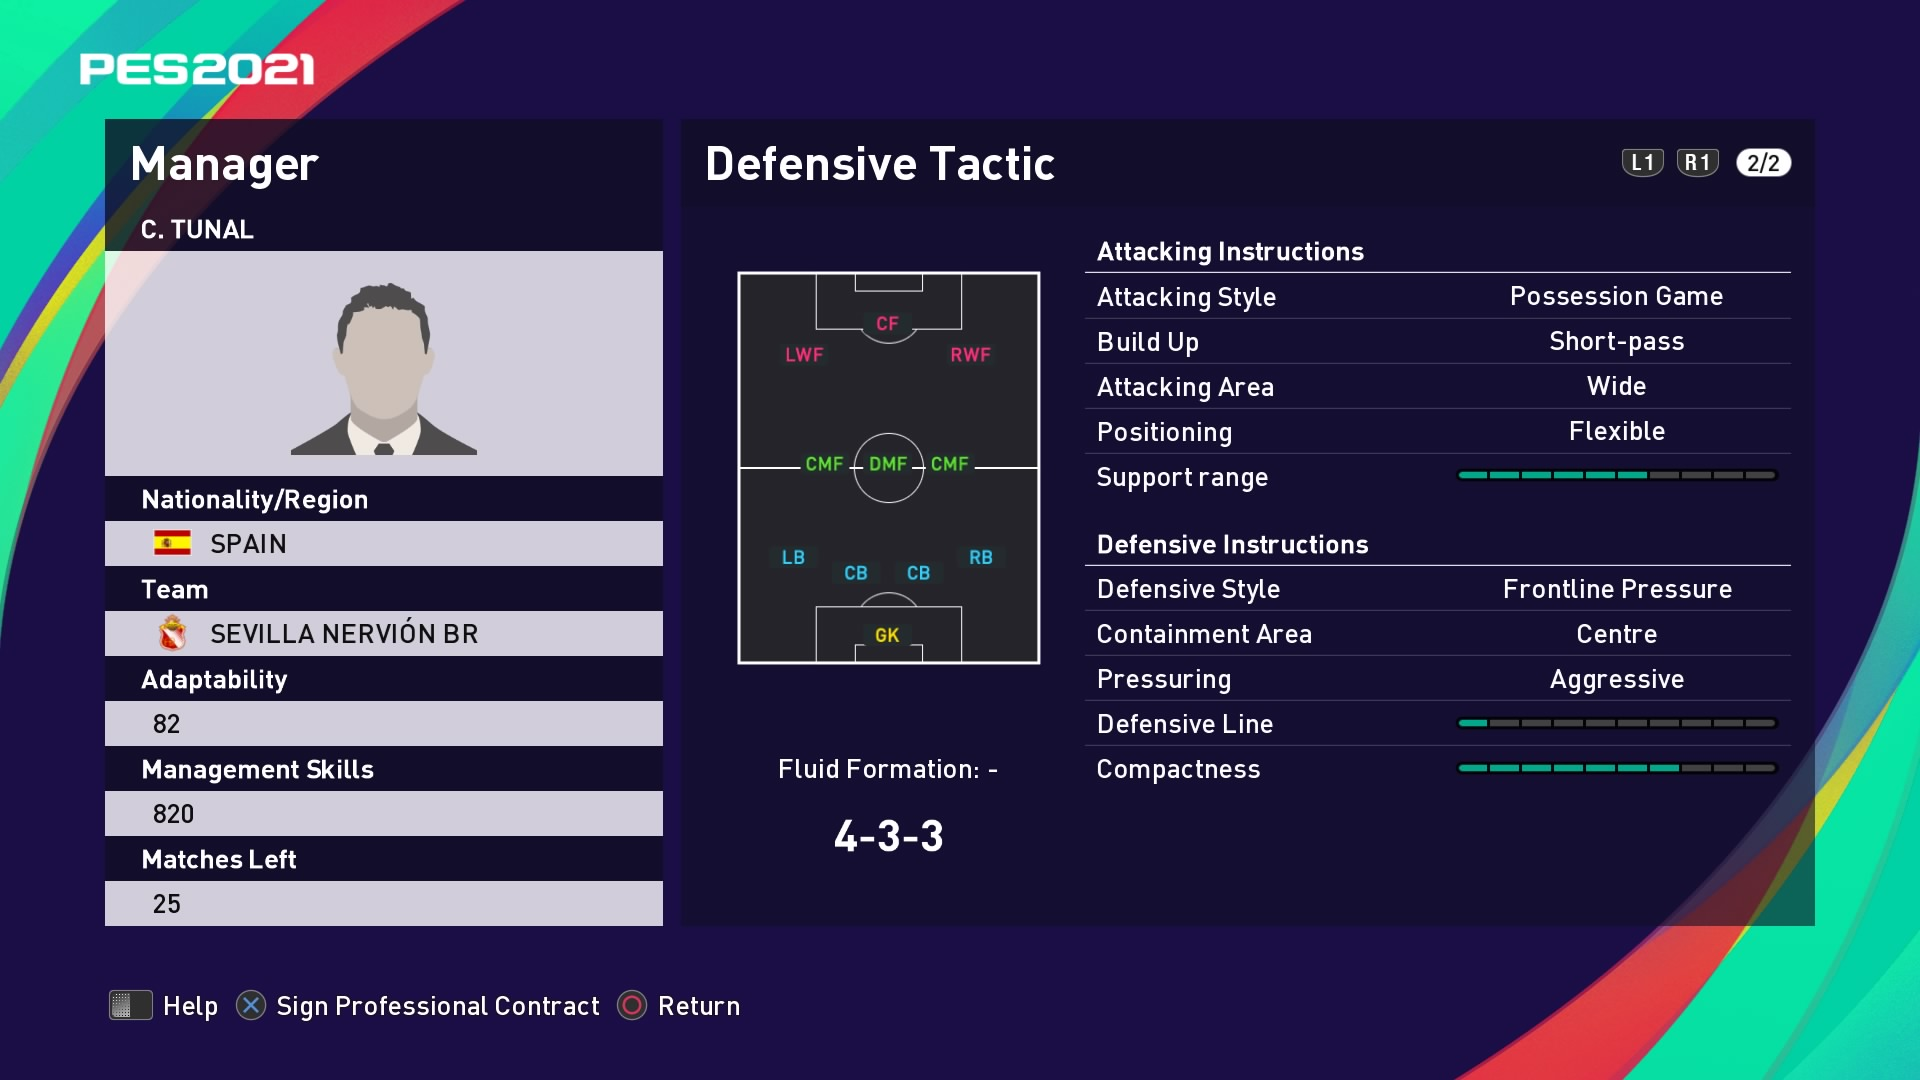 C. Tunal (Julen Lopetegui) Defensive Tactic in PES 2021 myClub